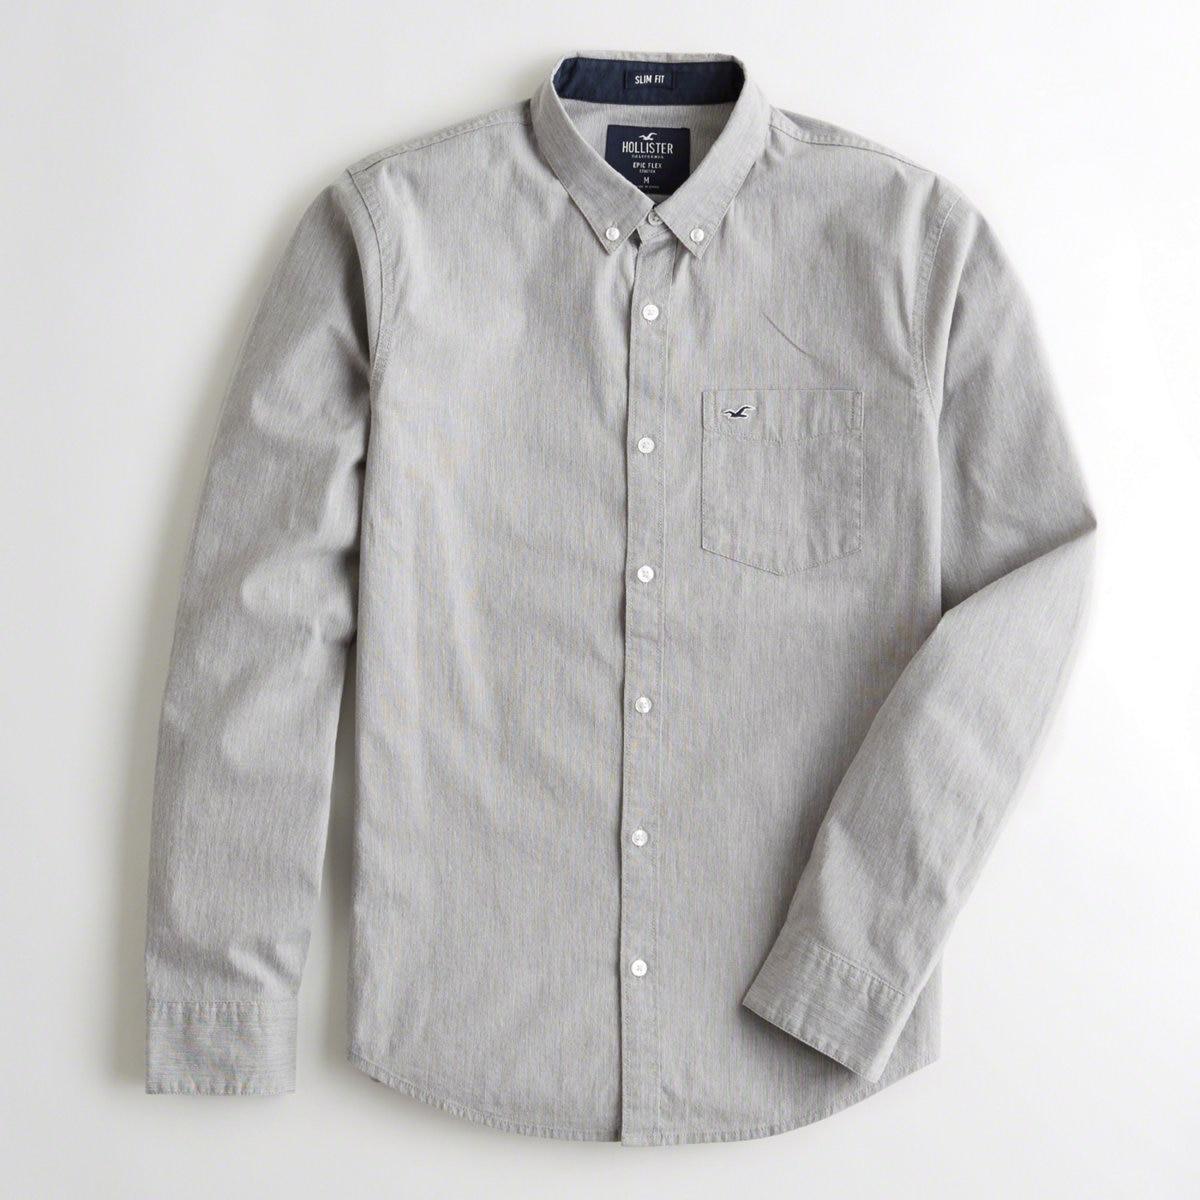 367ac195072 Lyst - Hollister Guys Stretch Poplin Slim Fit Shirt From Hollister ...